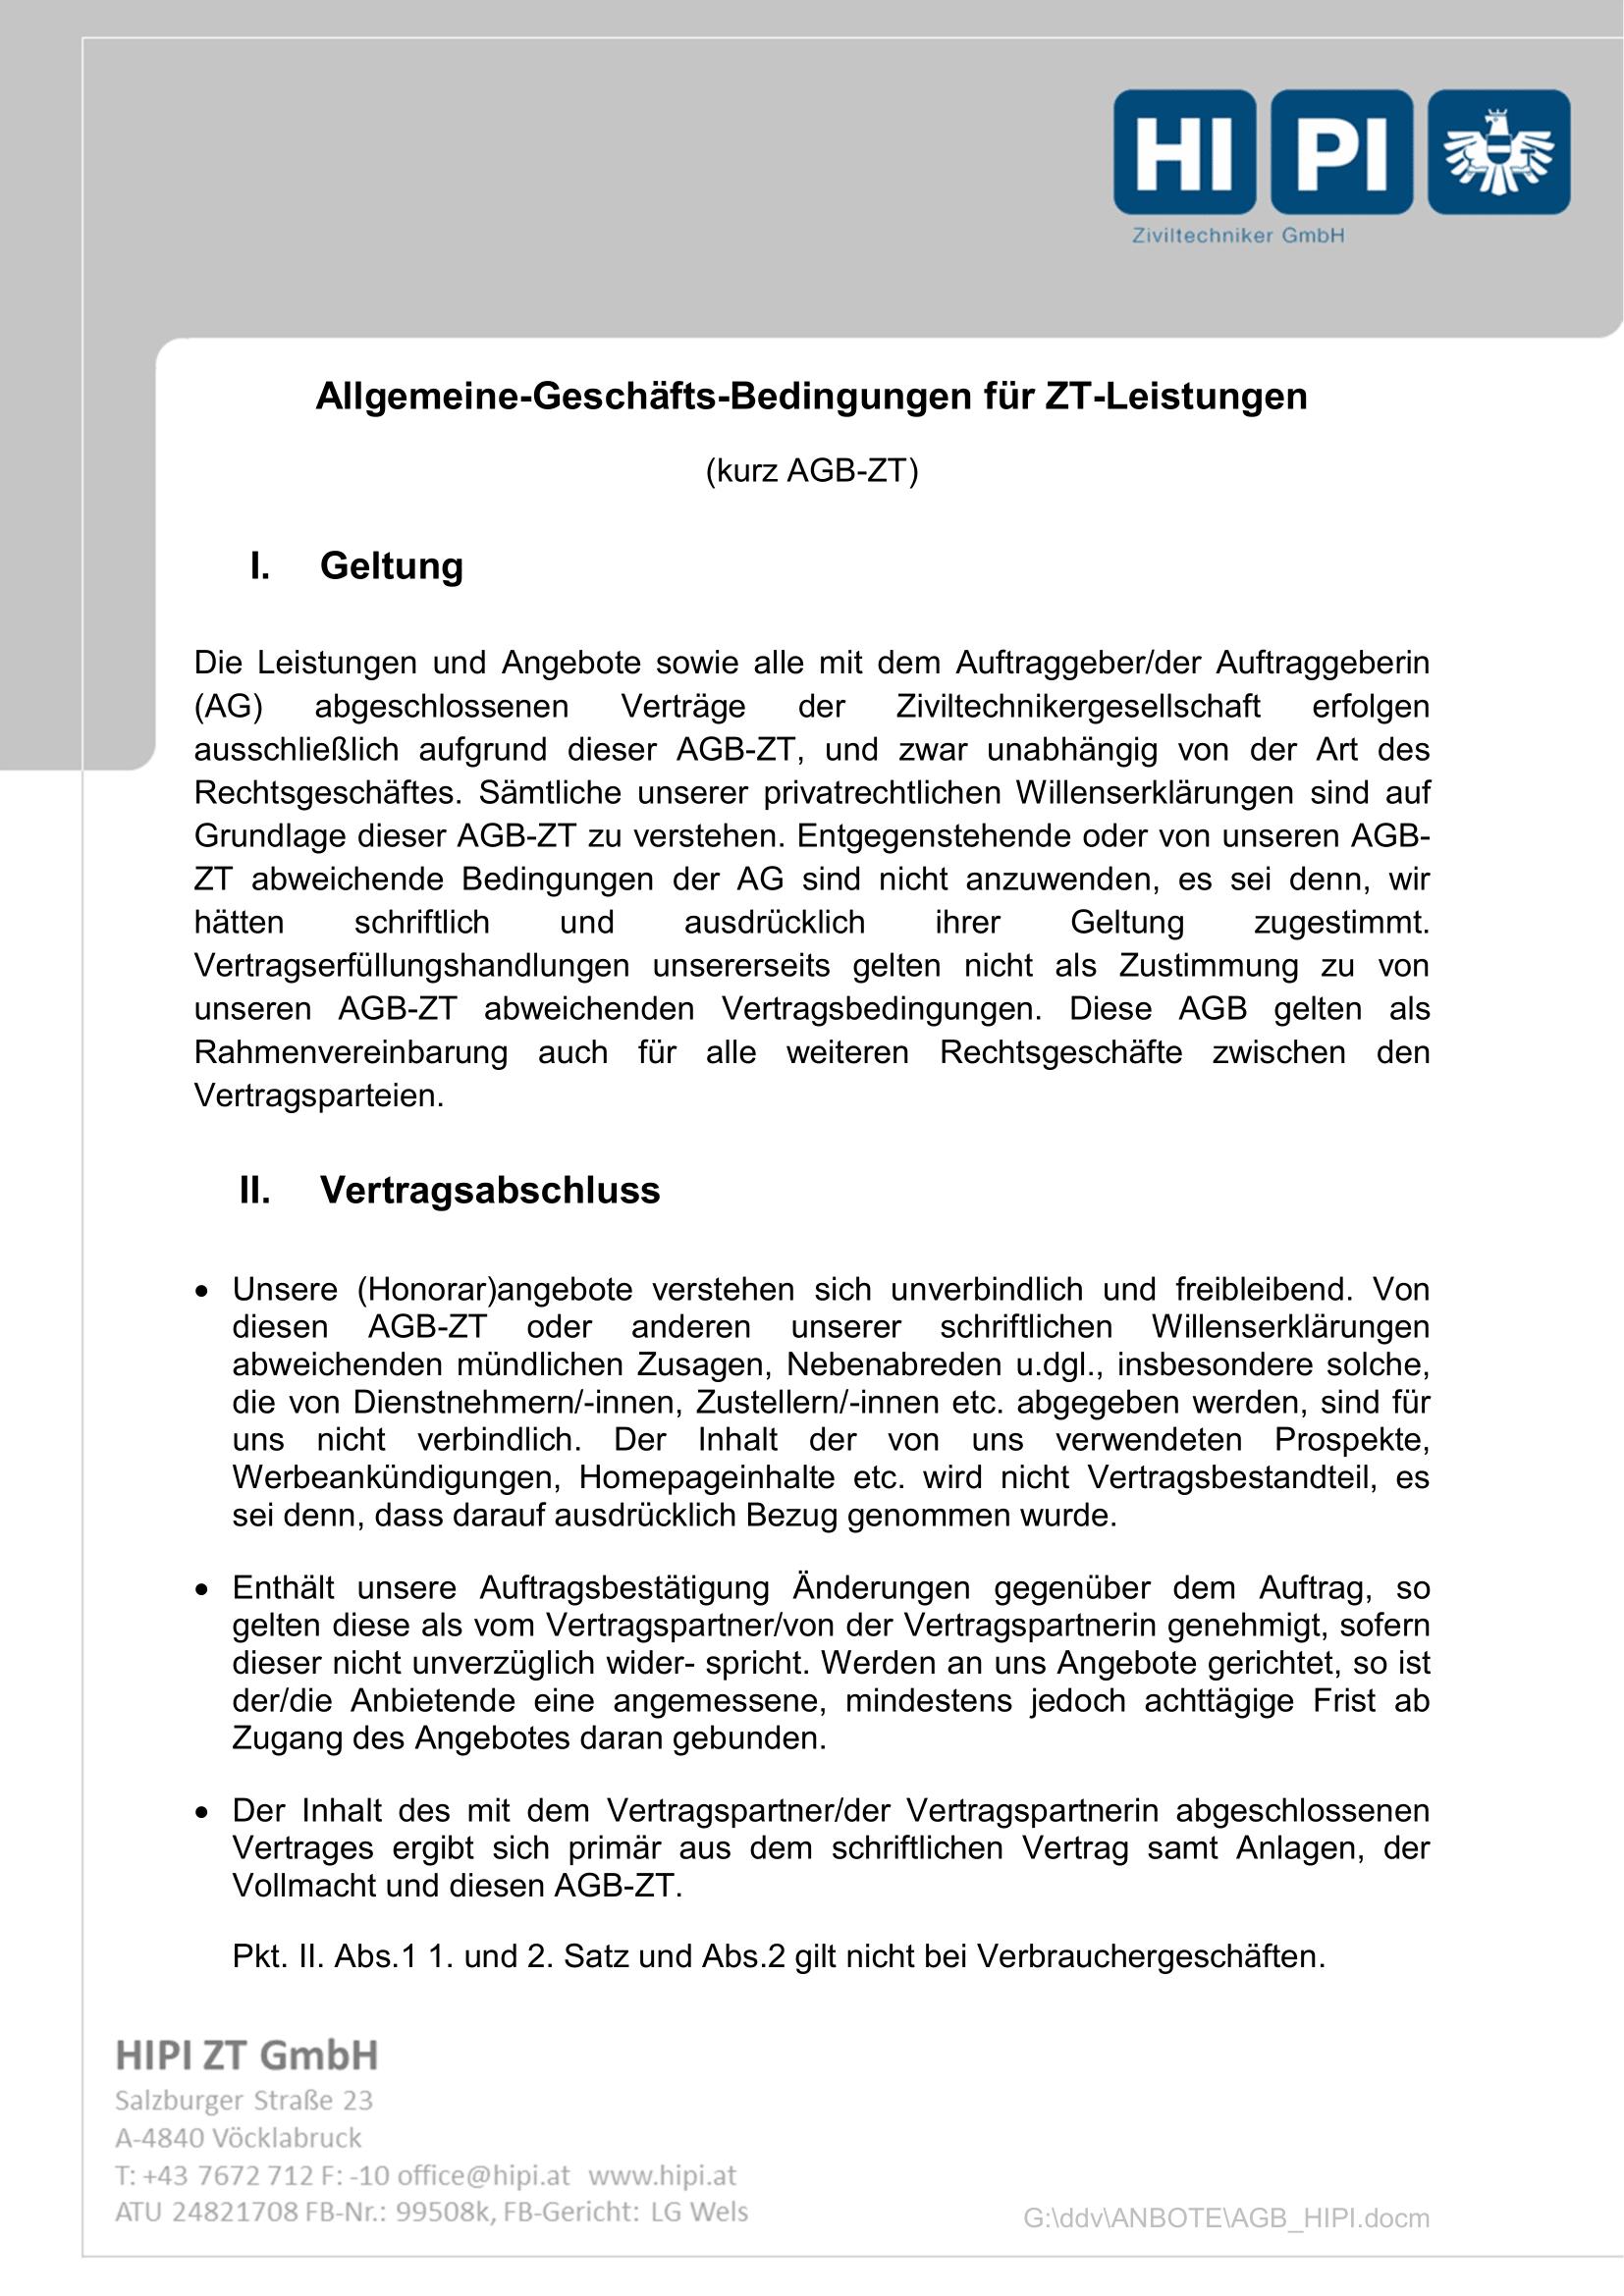 HIPI ZT GmbH AGB Seite 1